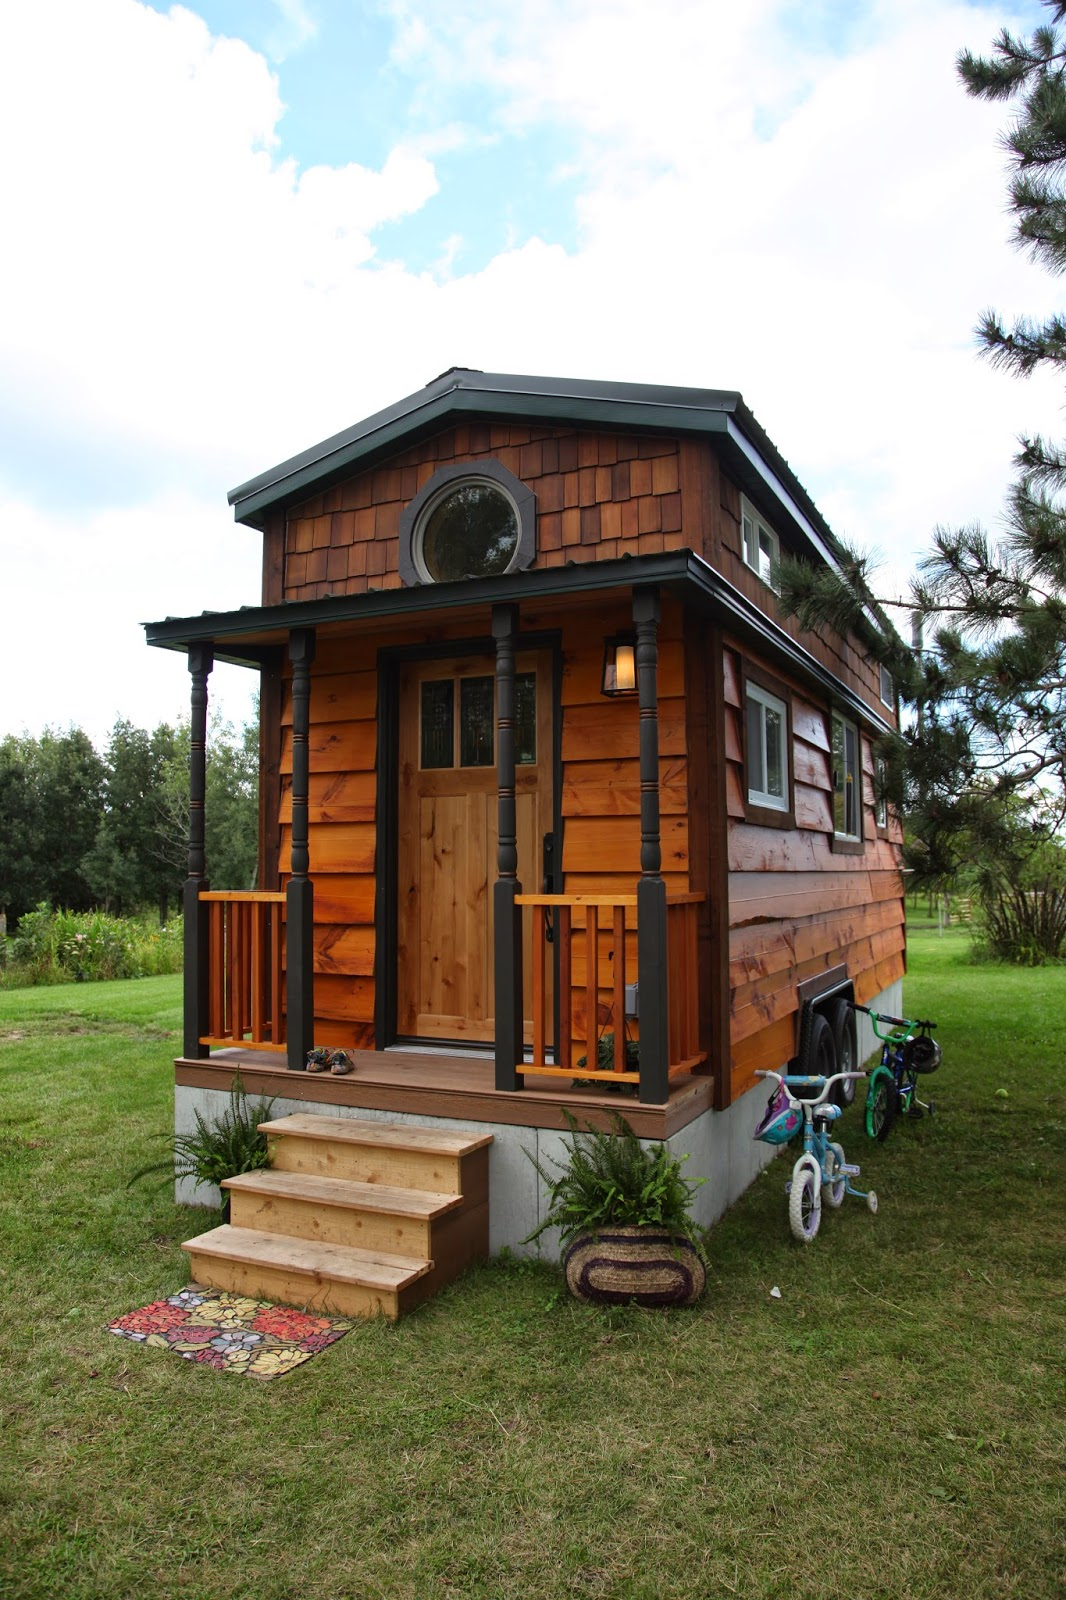 Lord help me she said tiny house for a family of for Tiny house family of 6